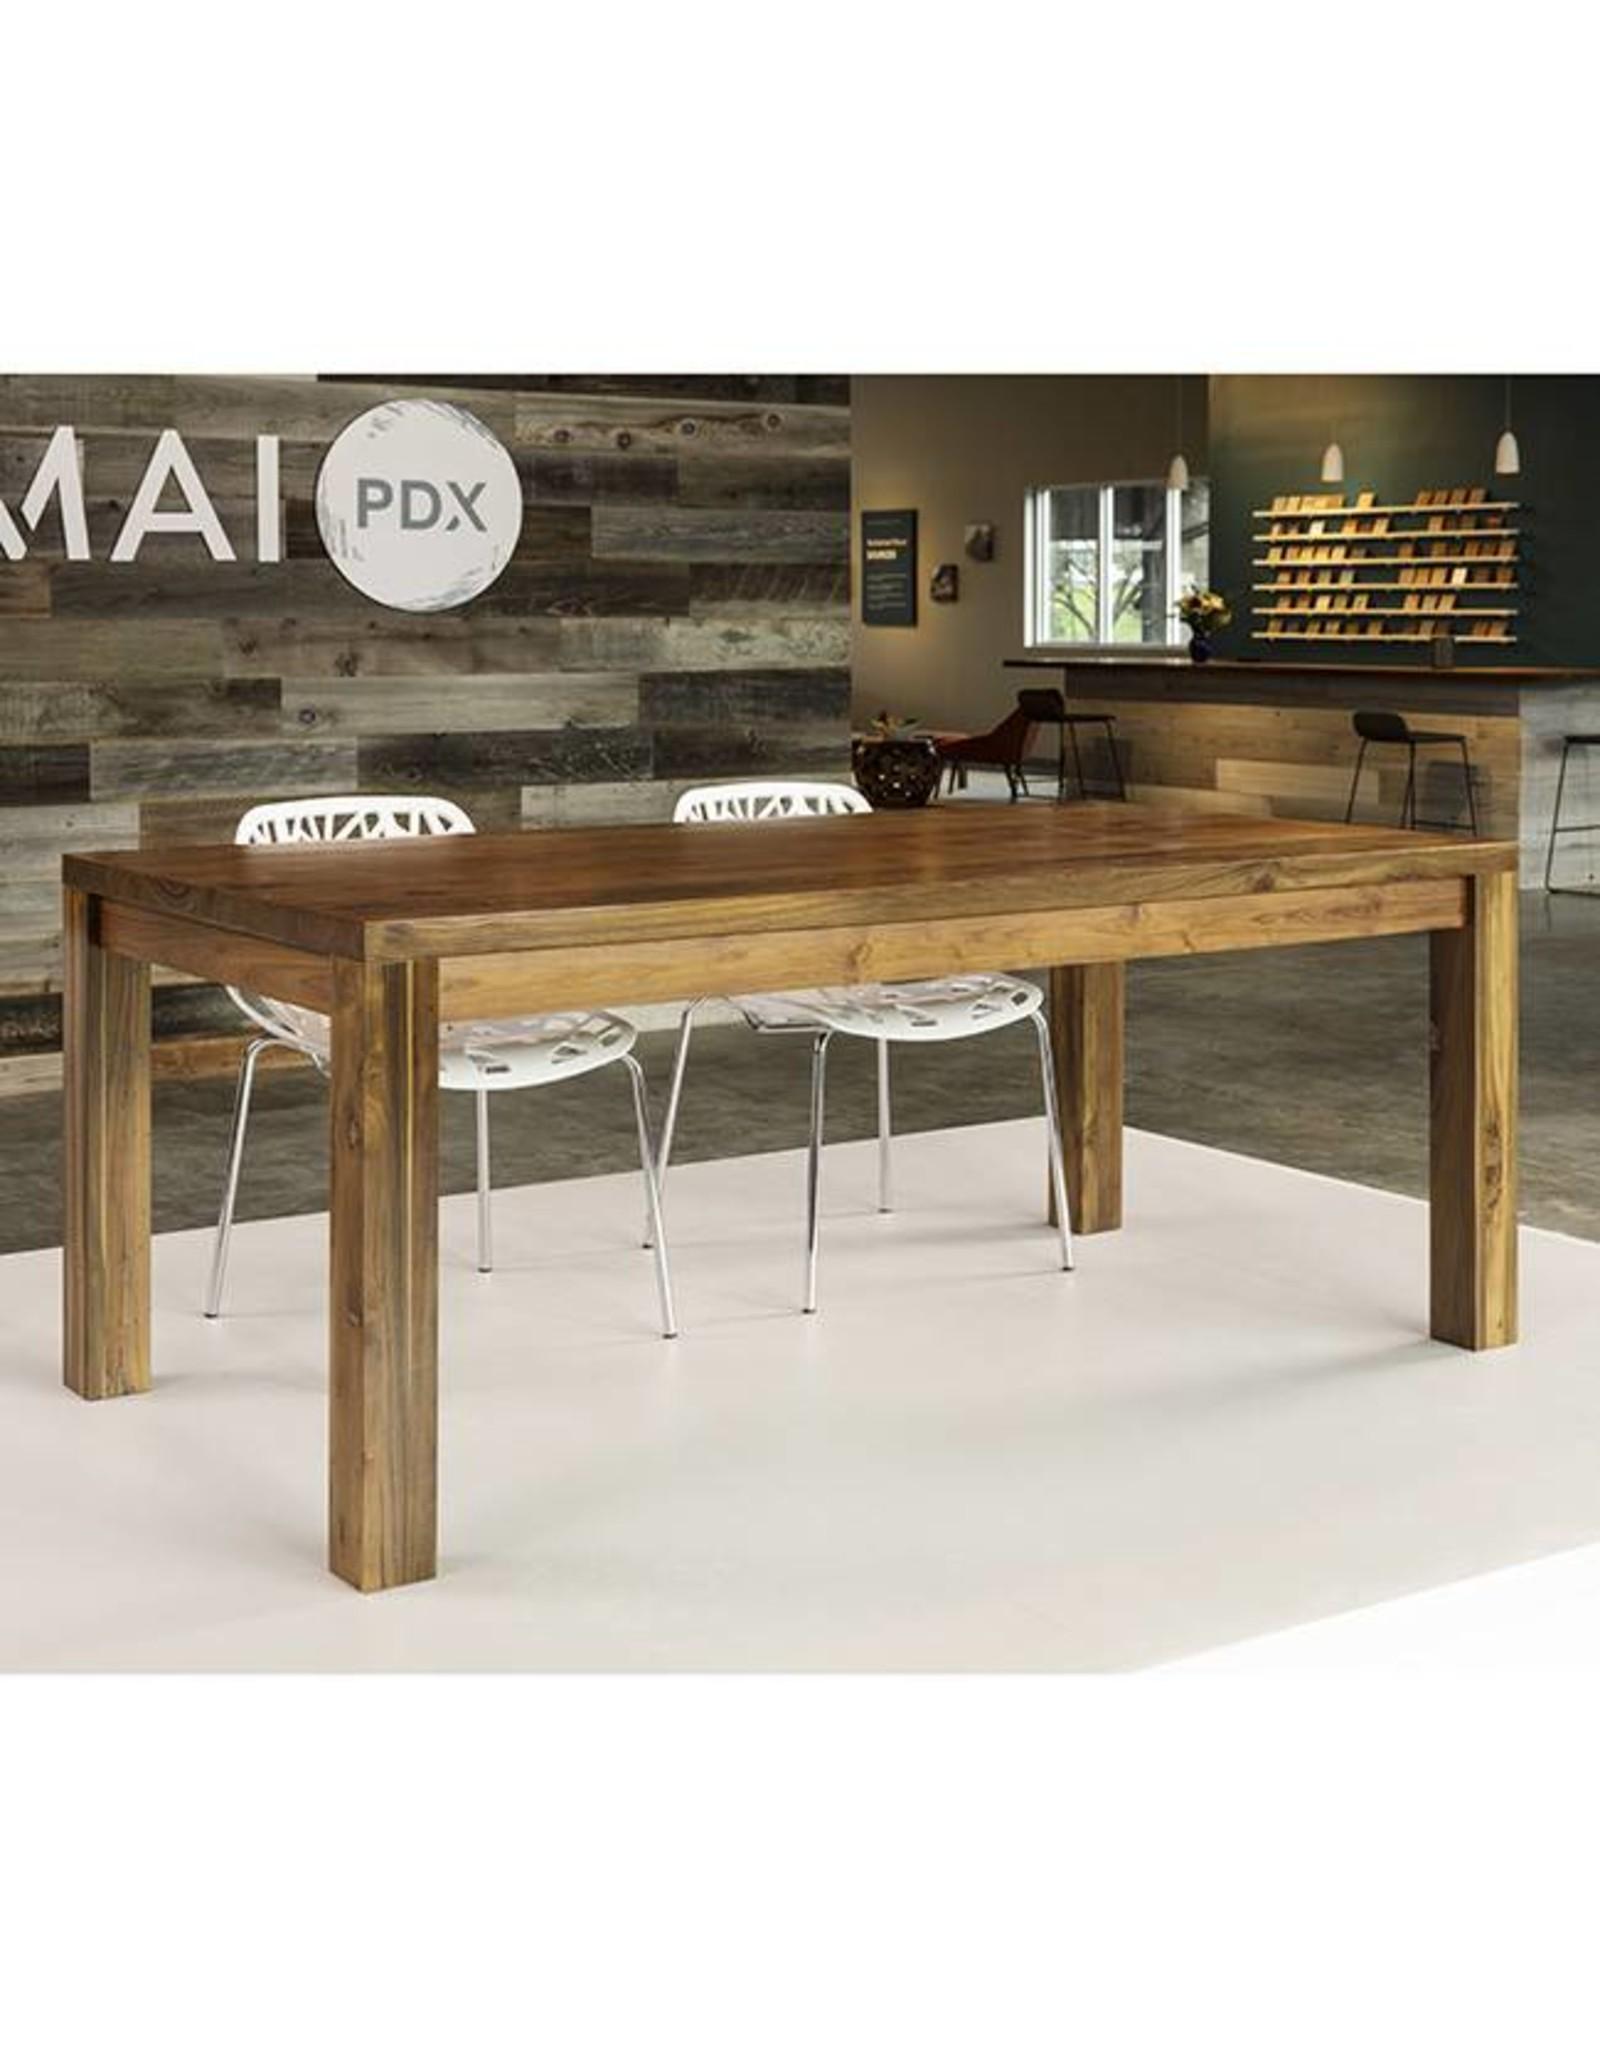 TerraMai PDX Teak Tables